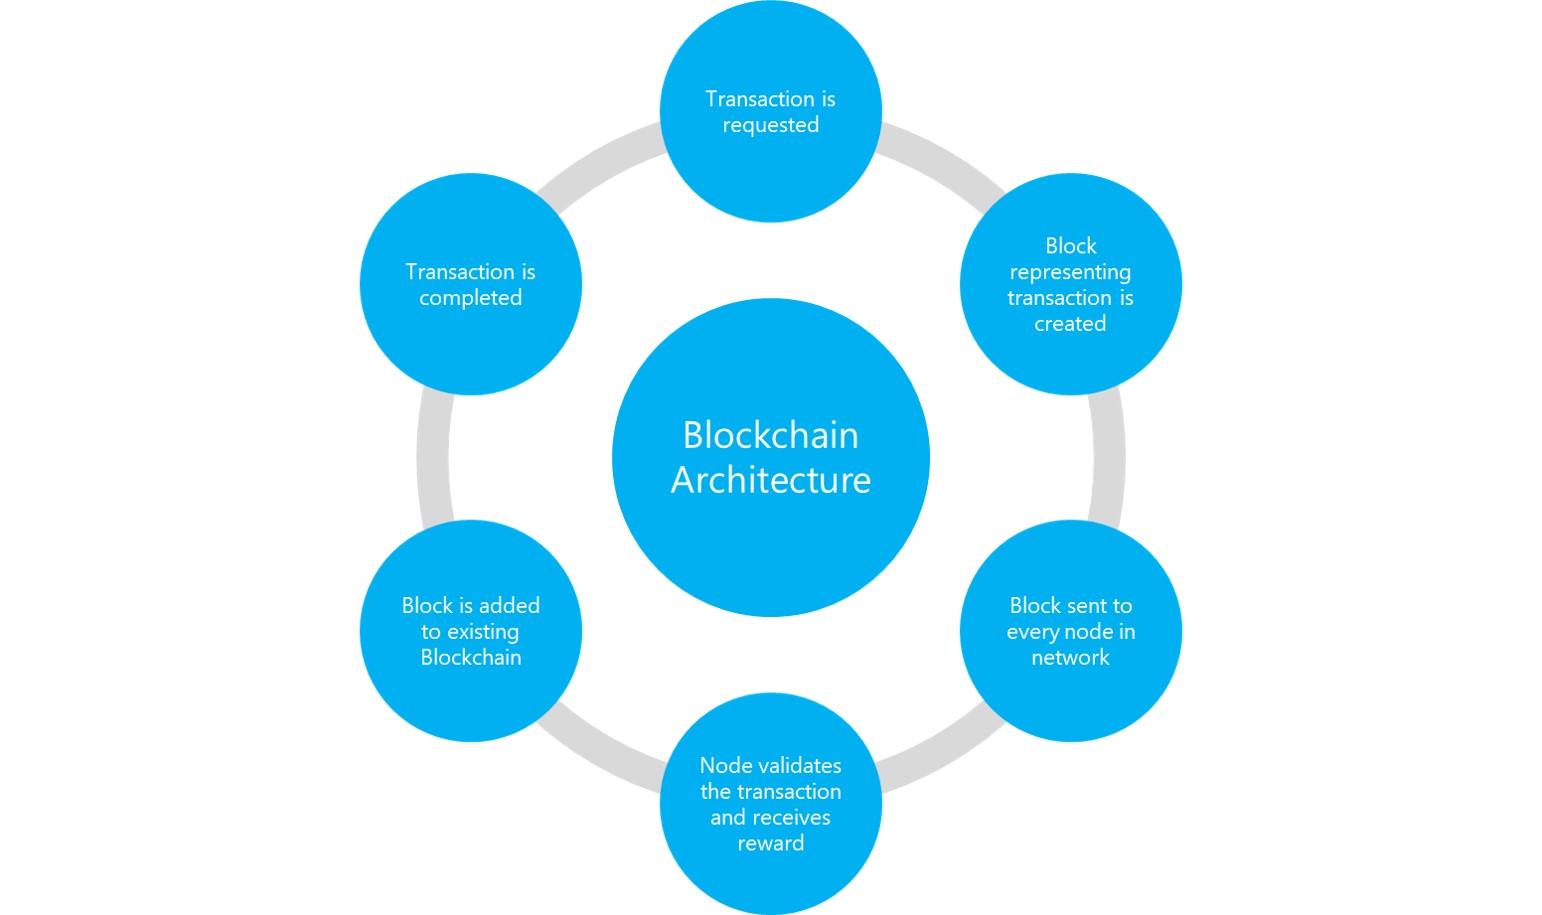 figure showing blockchain architecture